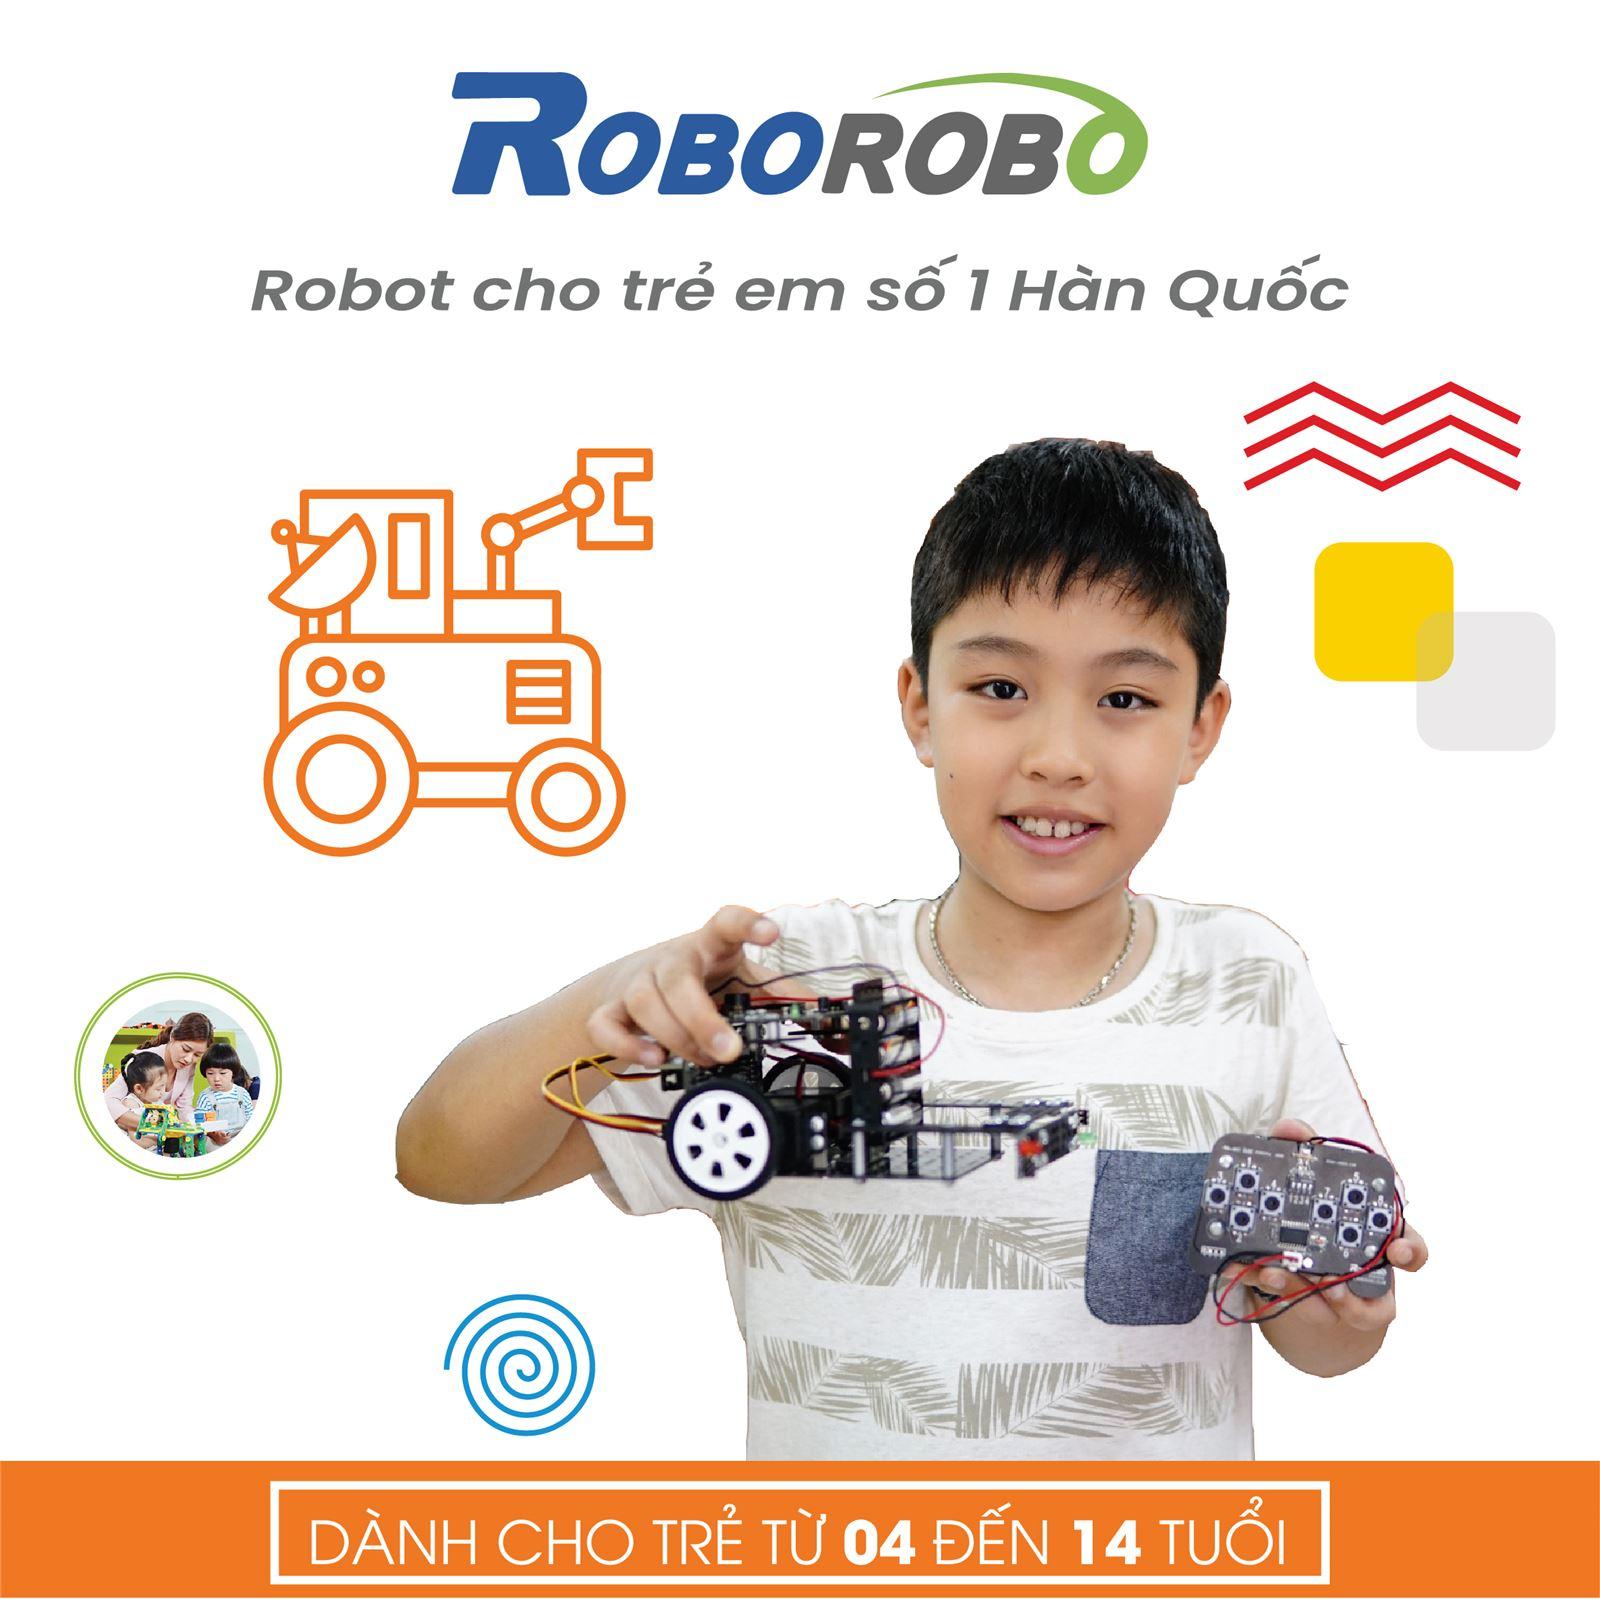 Về Roborobo